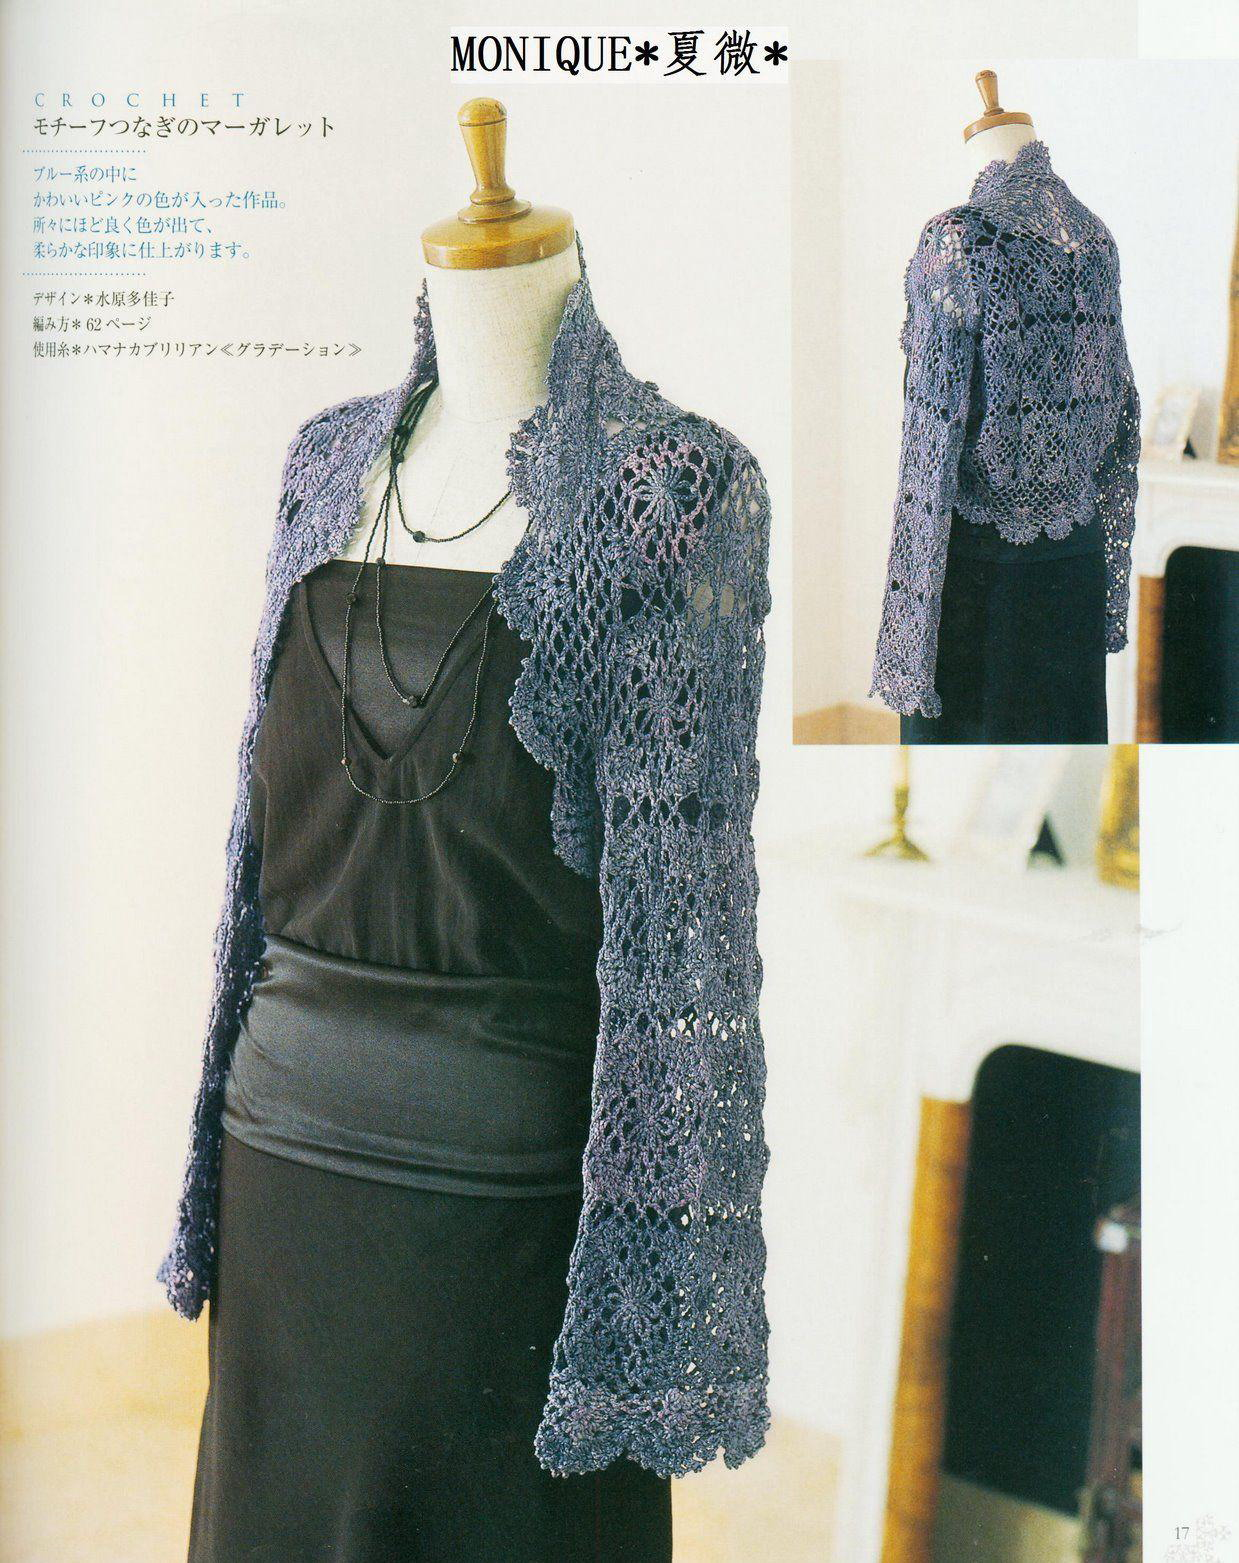 Square Motif Crochet Shrug Crochet Kingdom